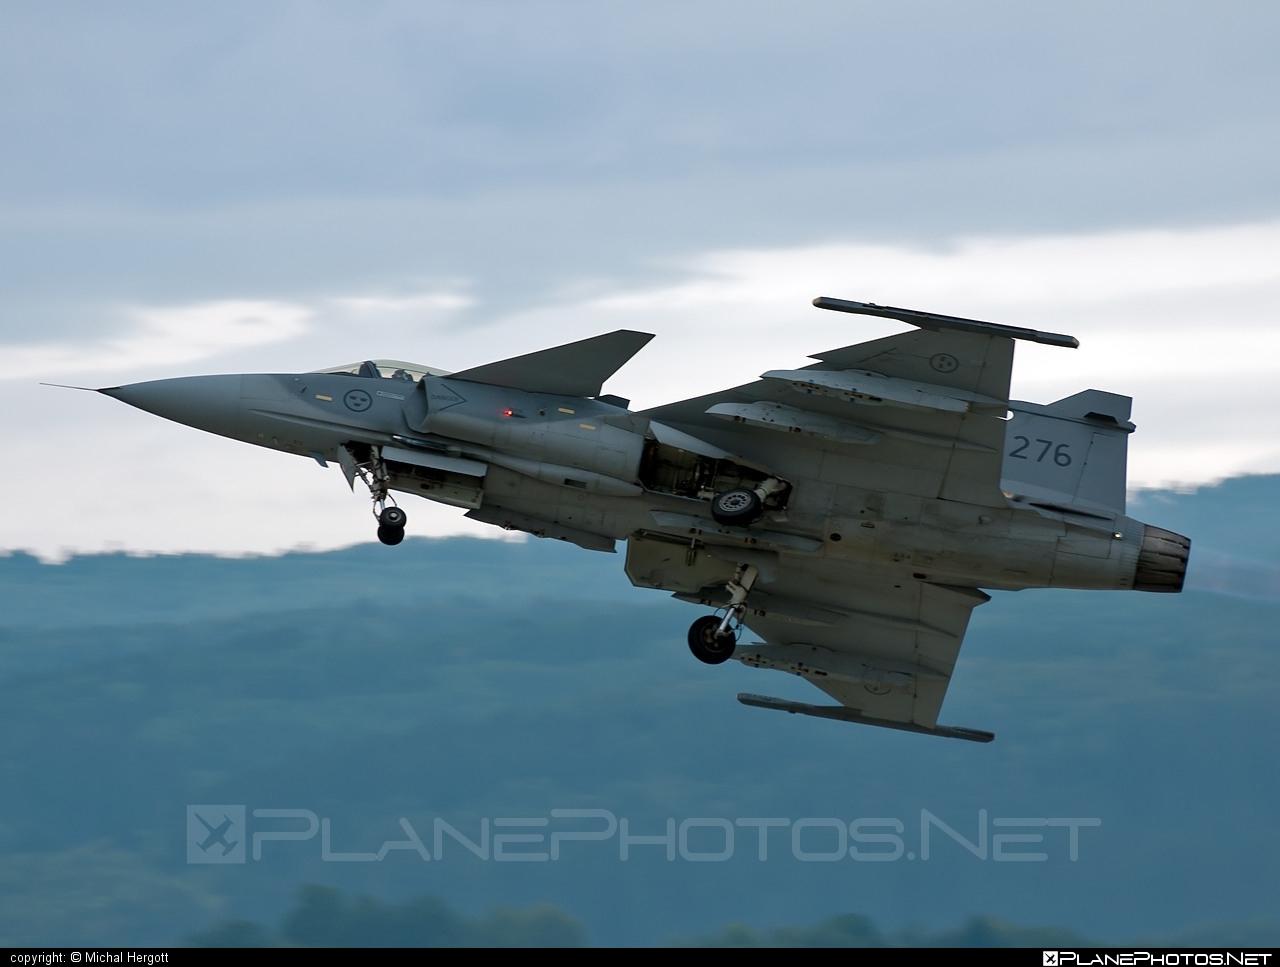 Saab JAS 39C Gripen - 39276 operated by Flygvapnet (Swedish Air Force) #flygvapnet #gripen #jas39 #jas39c #jas39gripen #saab #swedishairforce